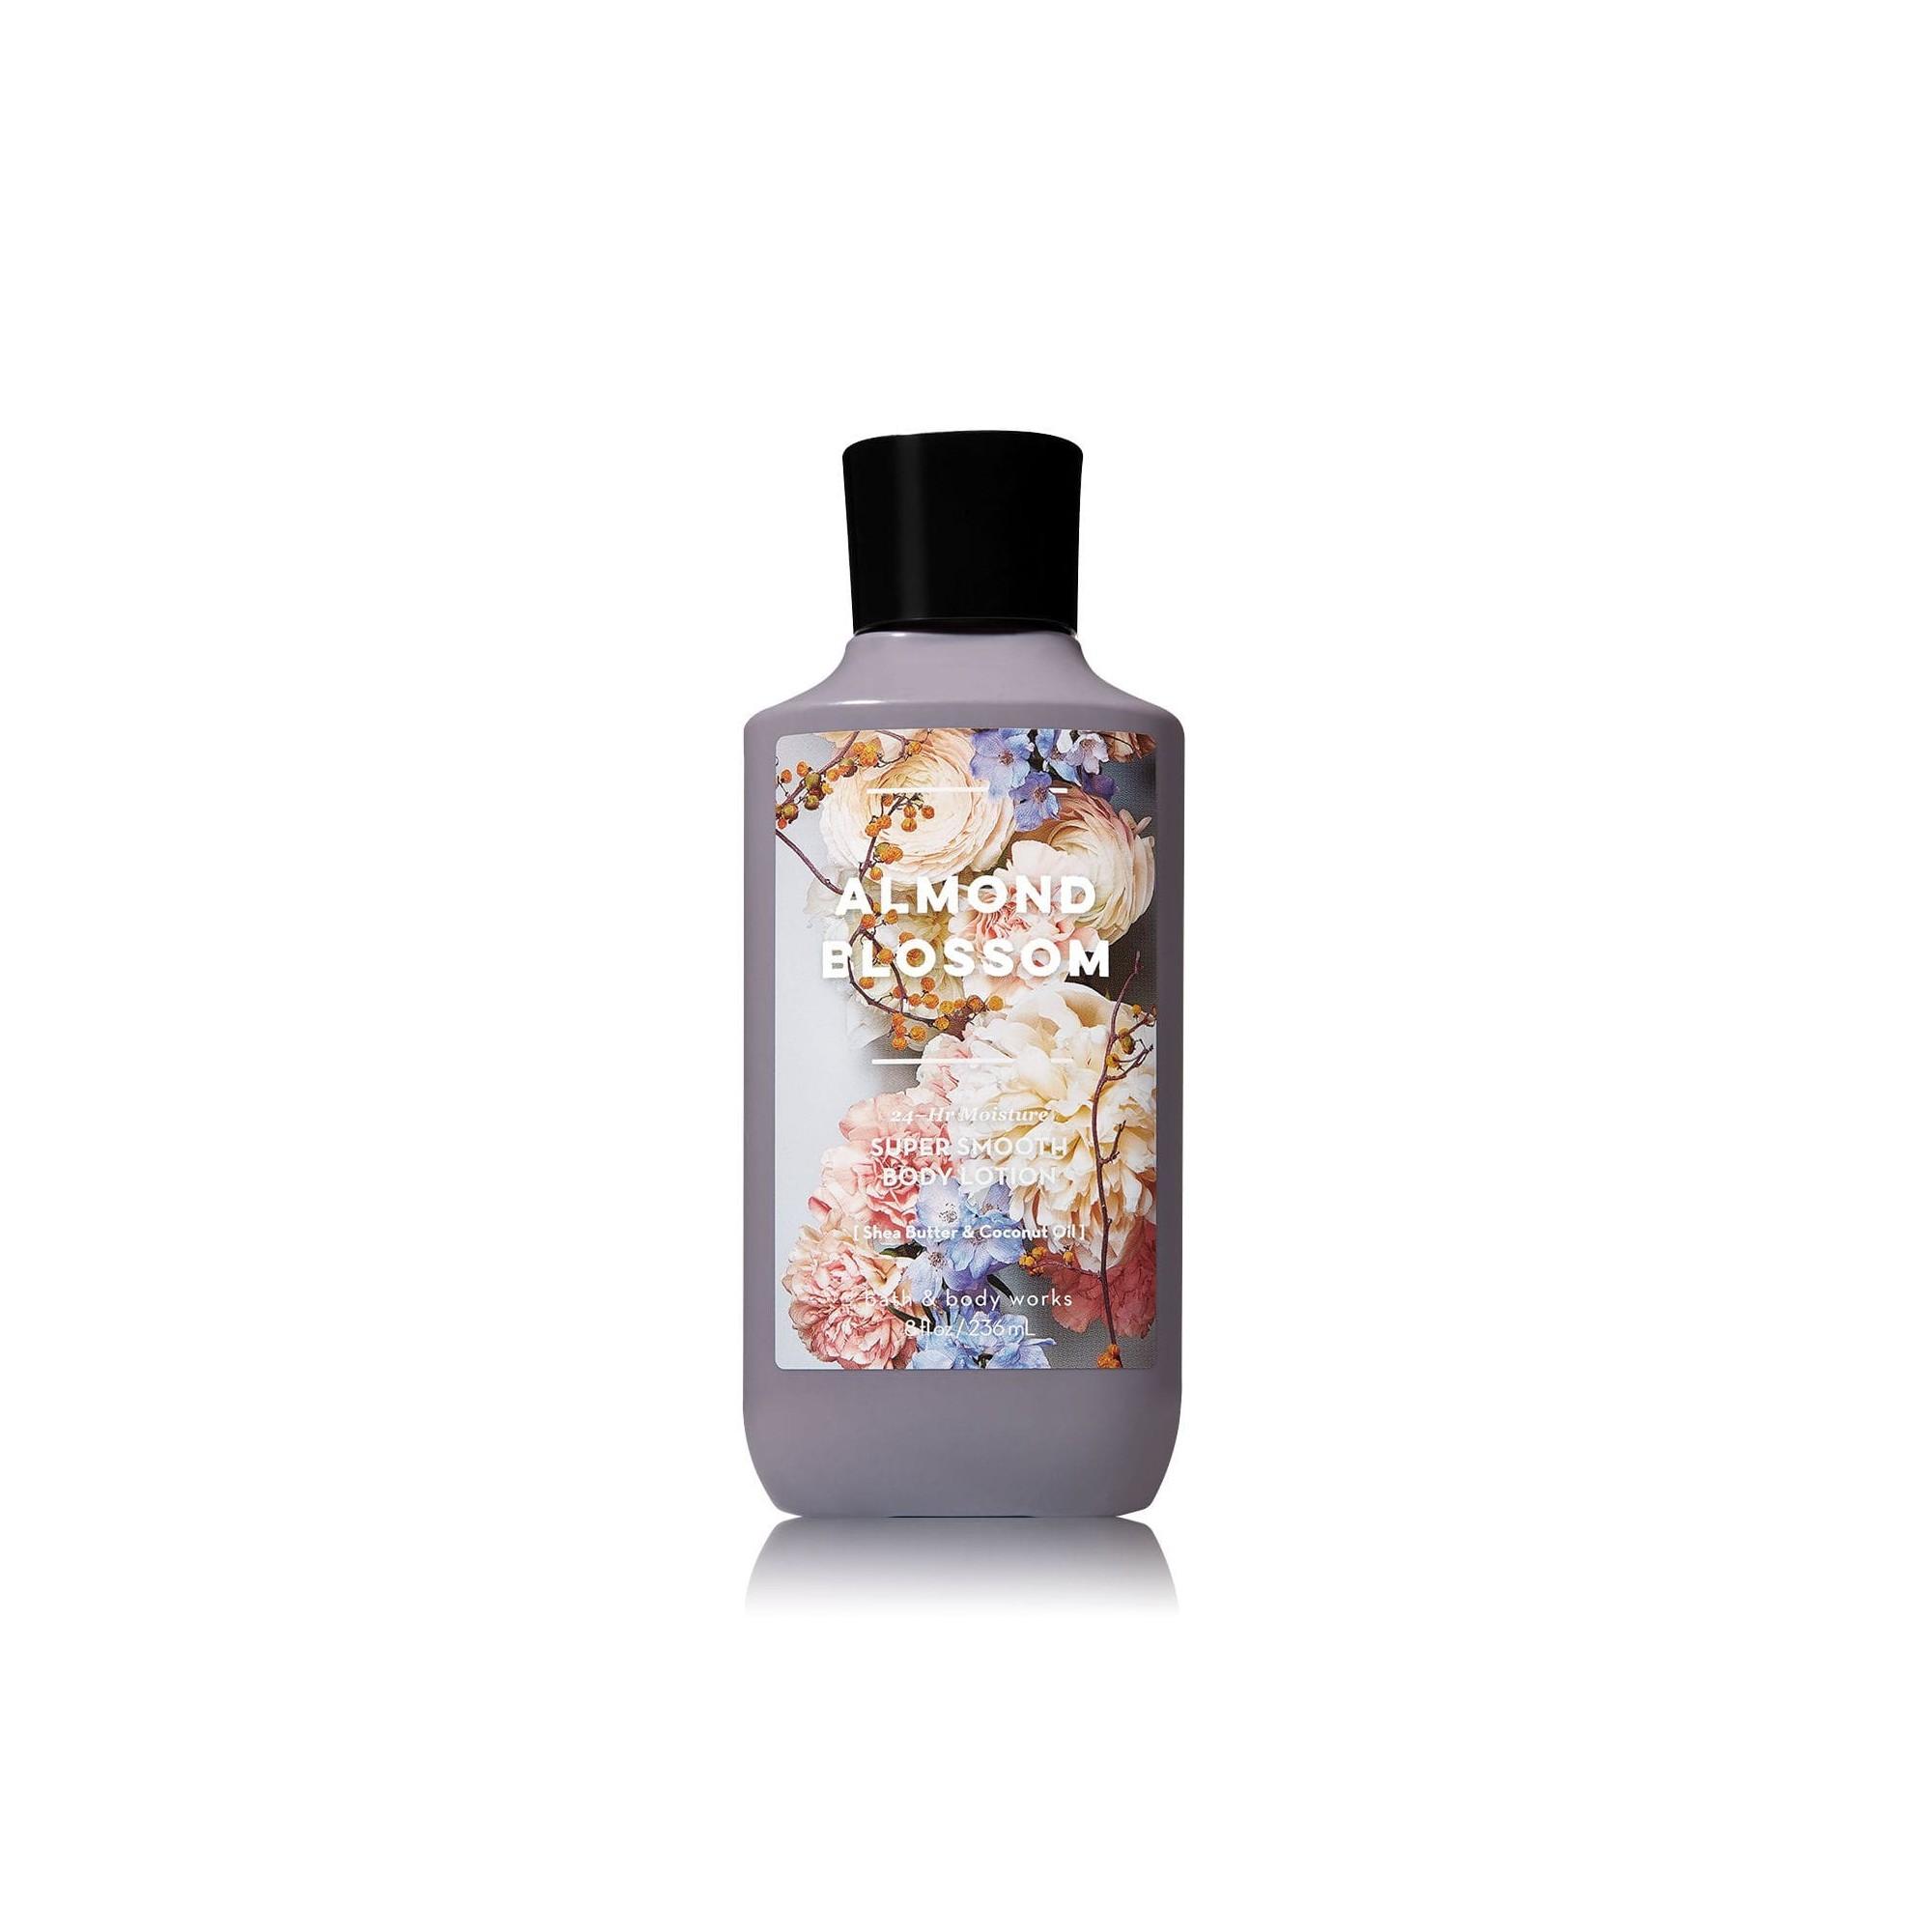 Bath & Body Works Almond Blossom Body Lotion